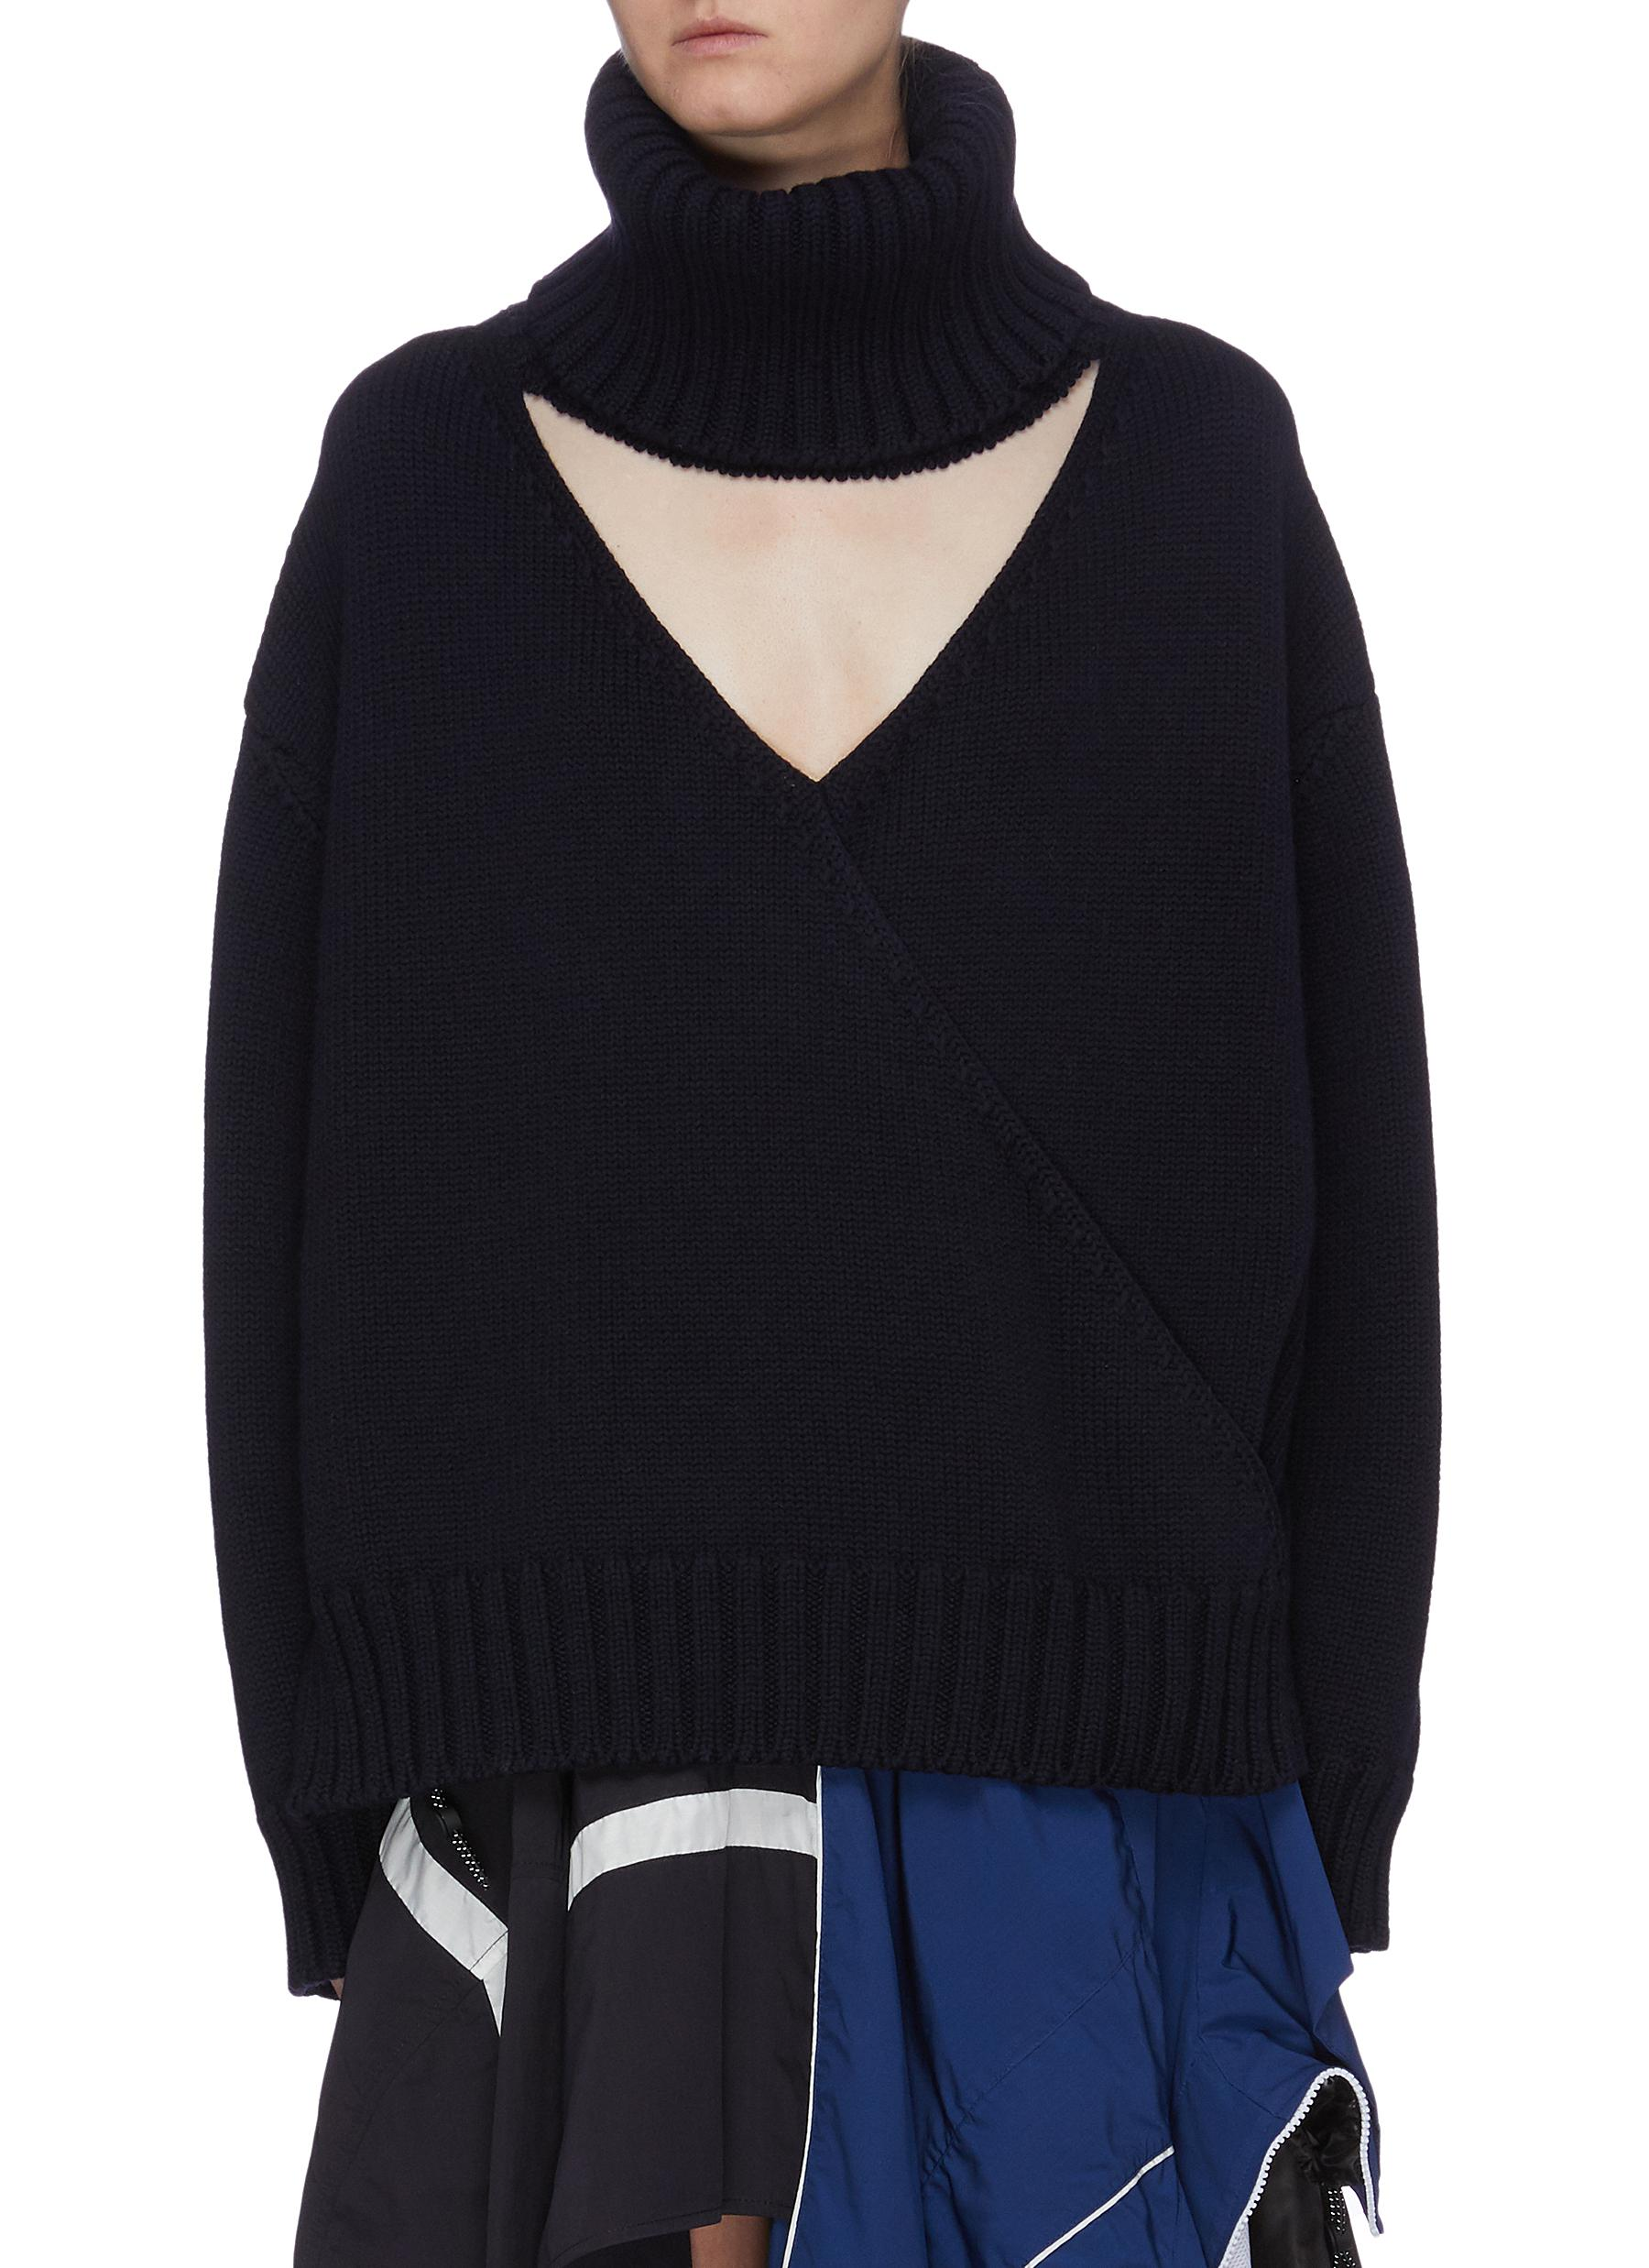 Cutout collar Merino wool turtleneck sweater by Monse